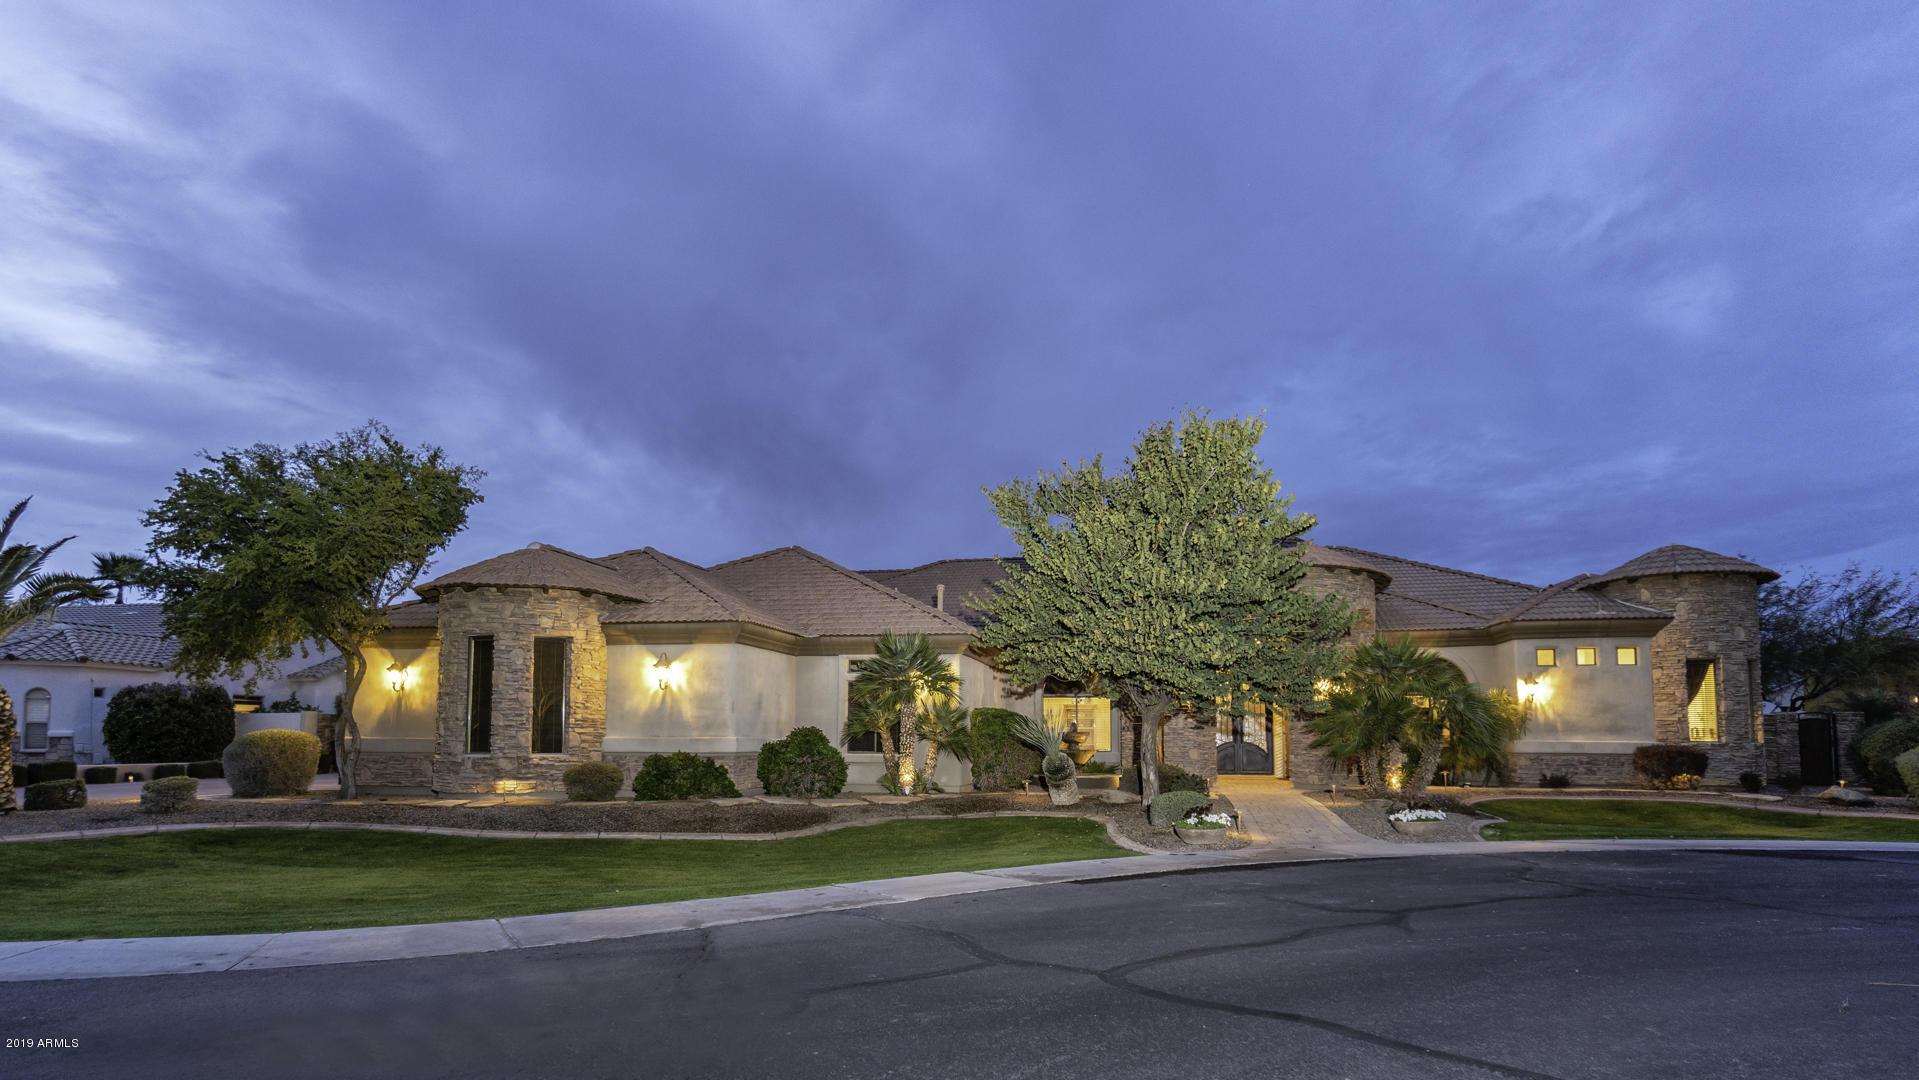 MLS 5885761 2880 E JADE Place, Chandler, AZ 85286 4 Bedrooms